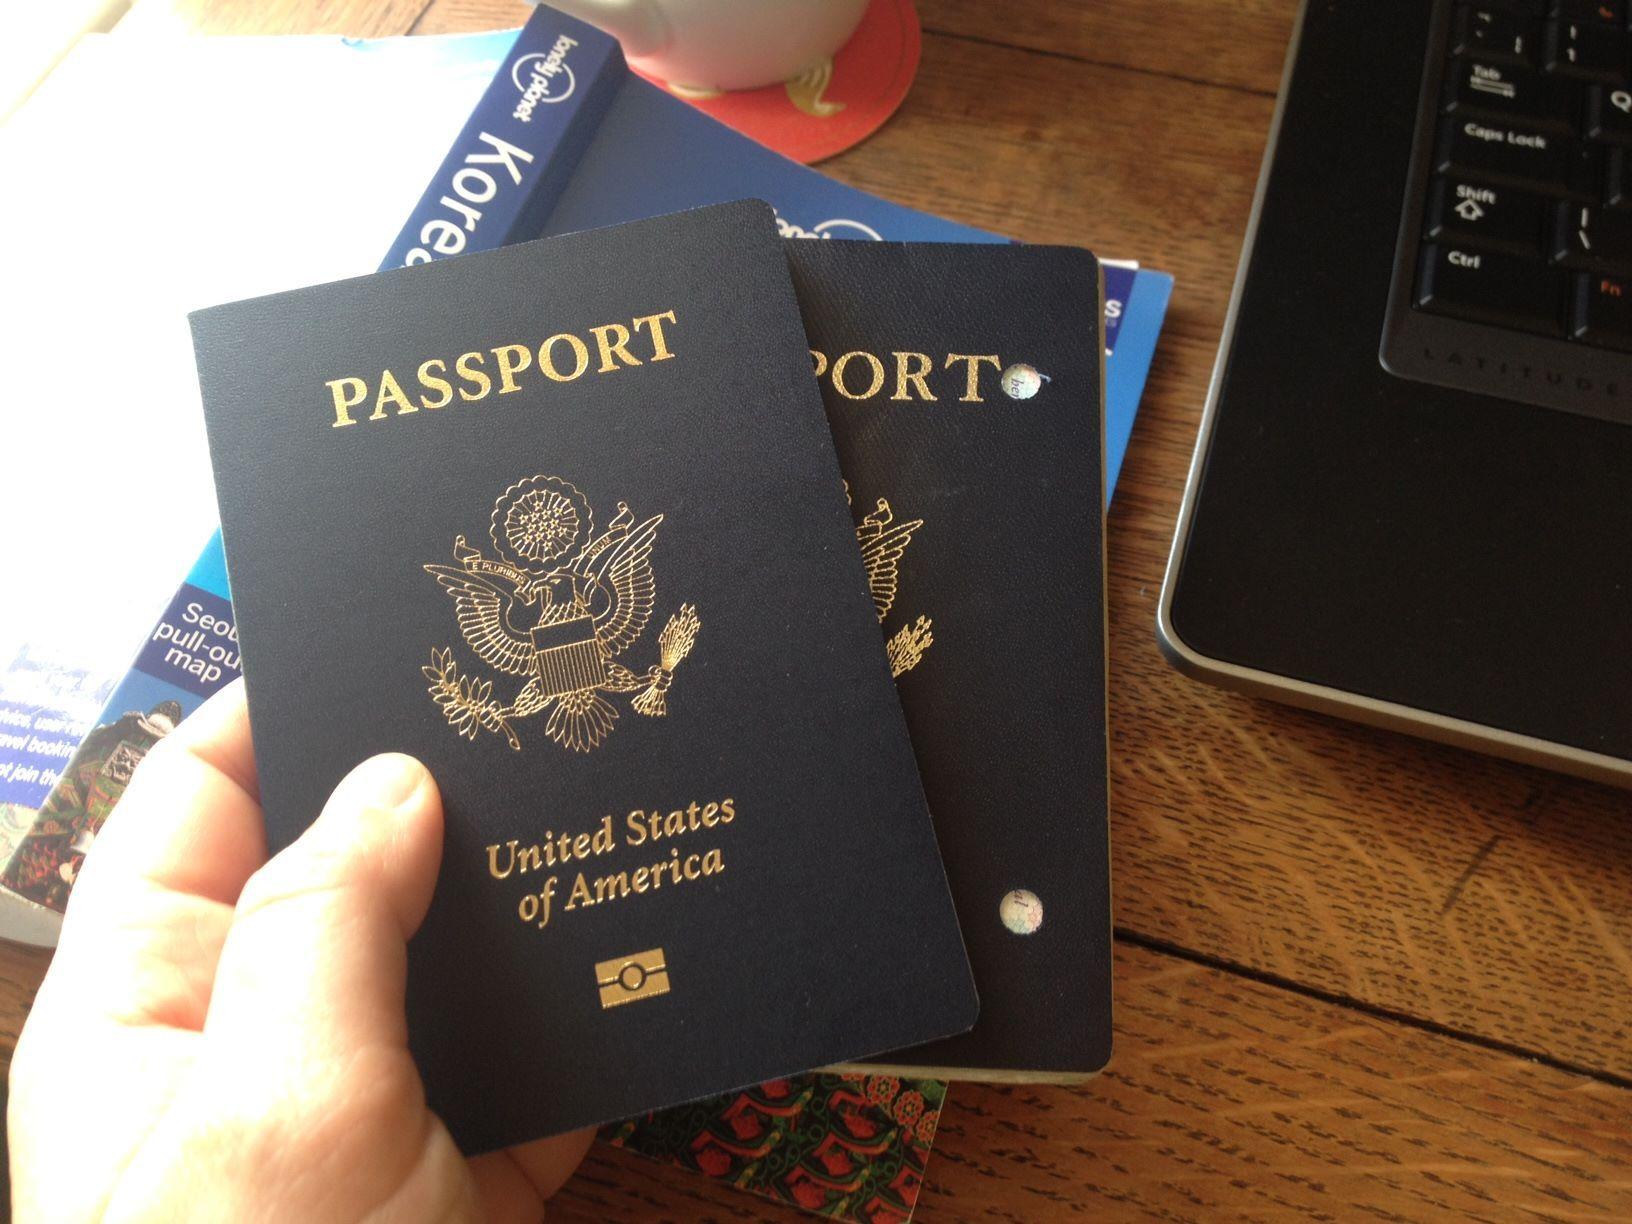 Buy Real biometric passport Online in 2020 Passport